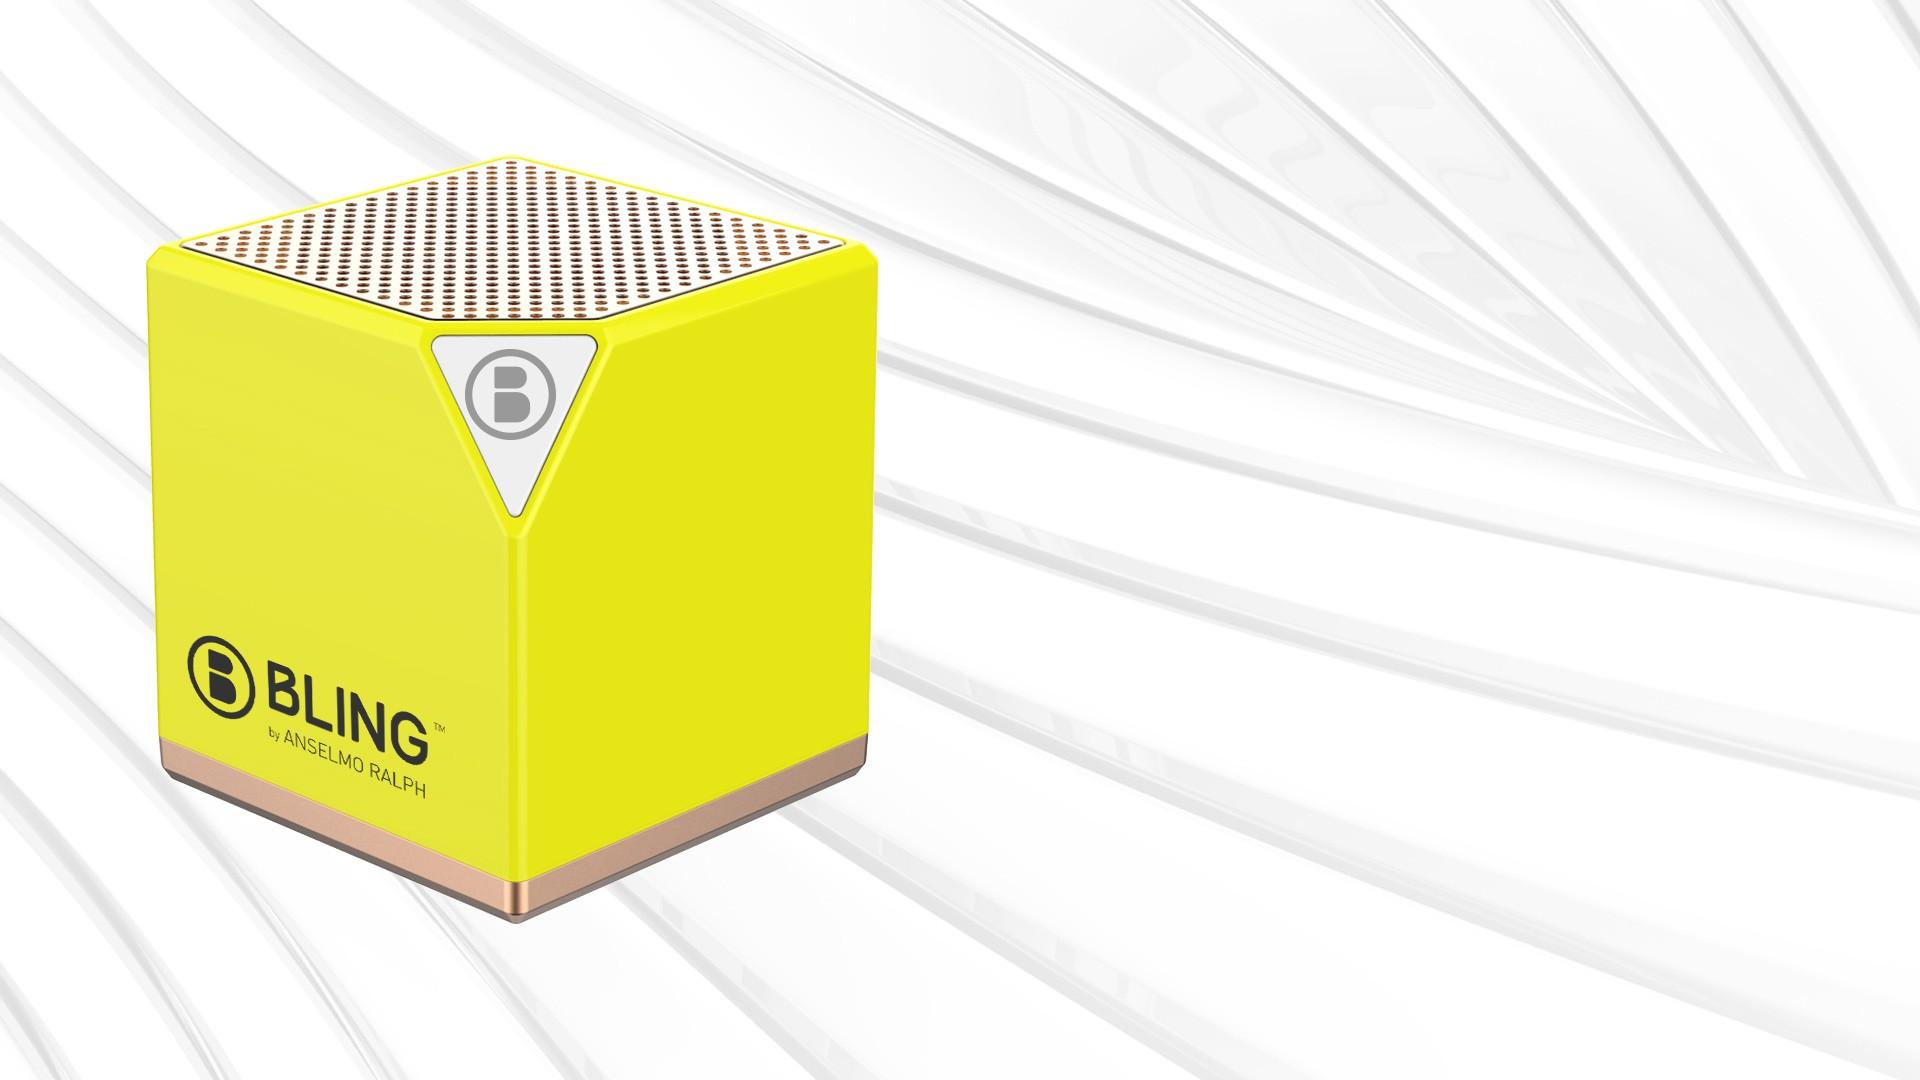 rythm box 06